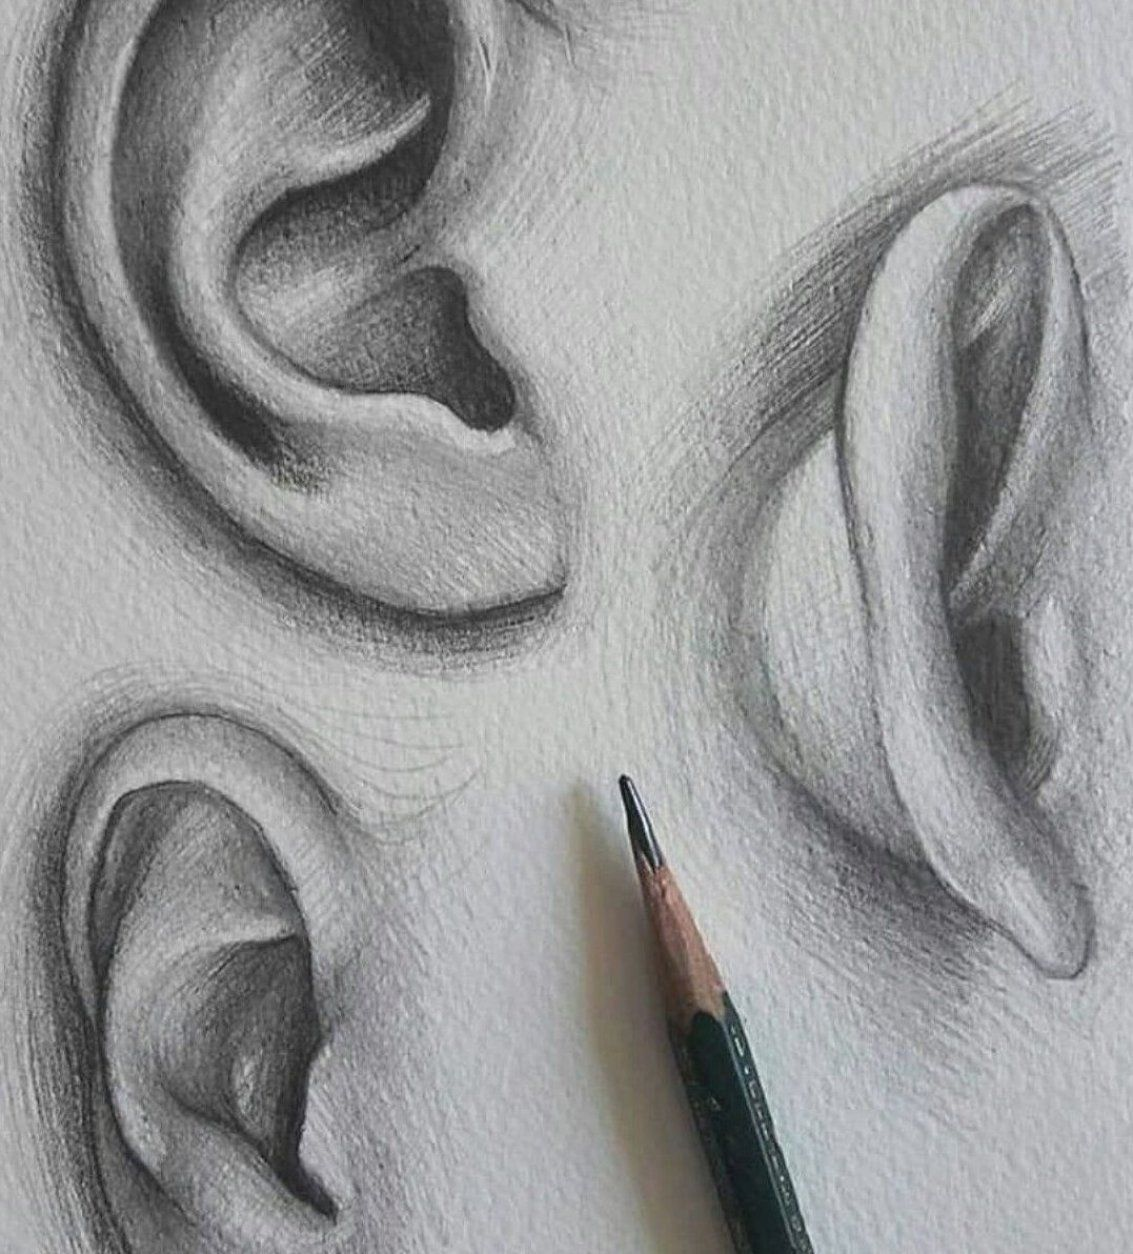 Drawing ears     -  Drawing ears      - #drawing #Ears #FineArt #OilPaintings #PencilPortrait